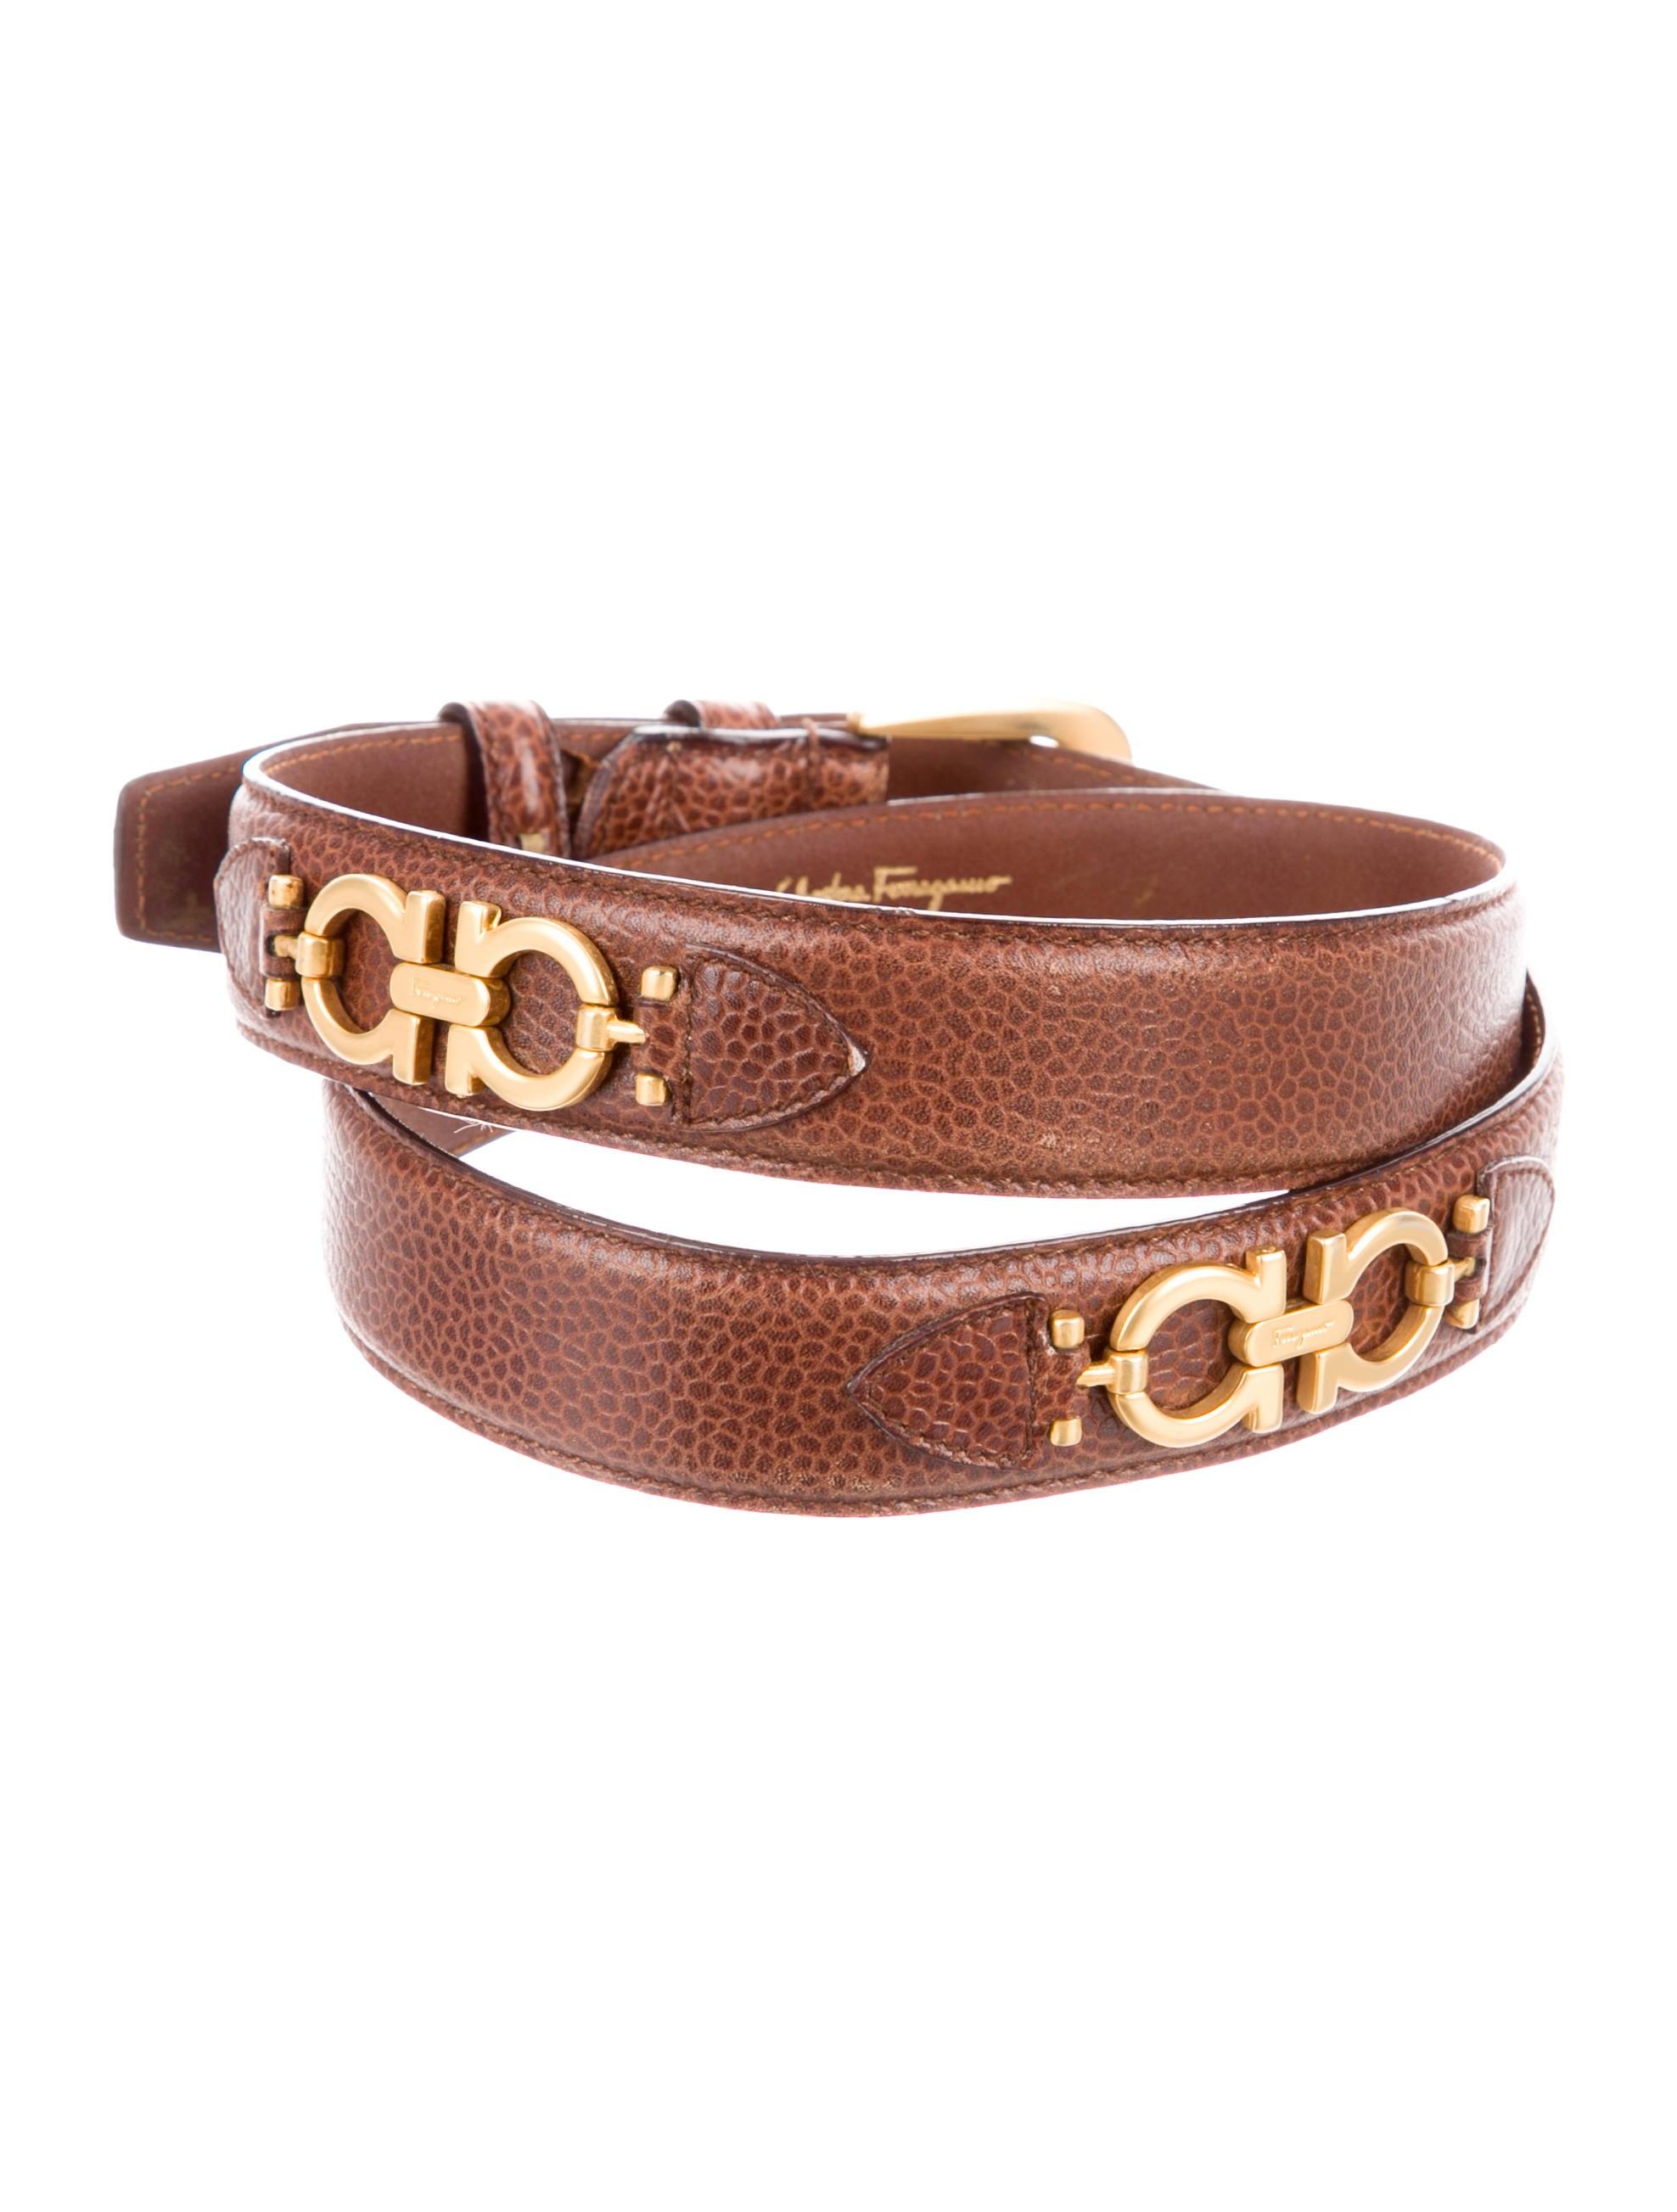 salvatore ferragamo gancini leather belt accessories